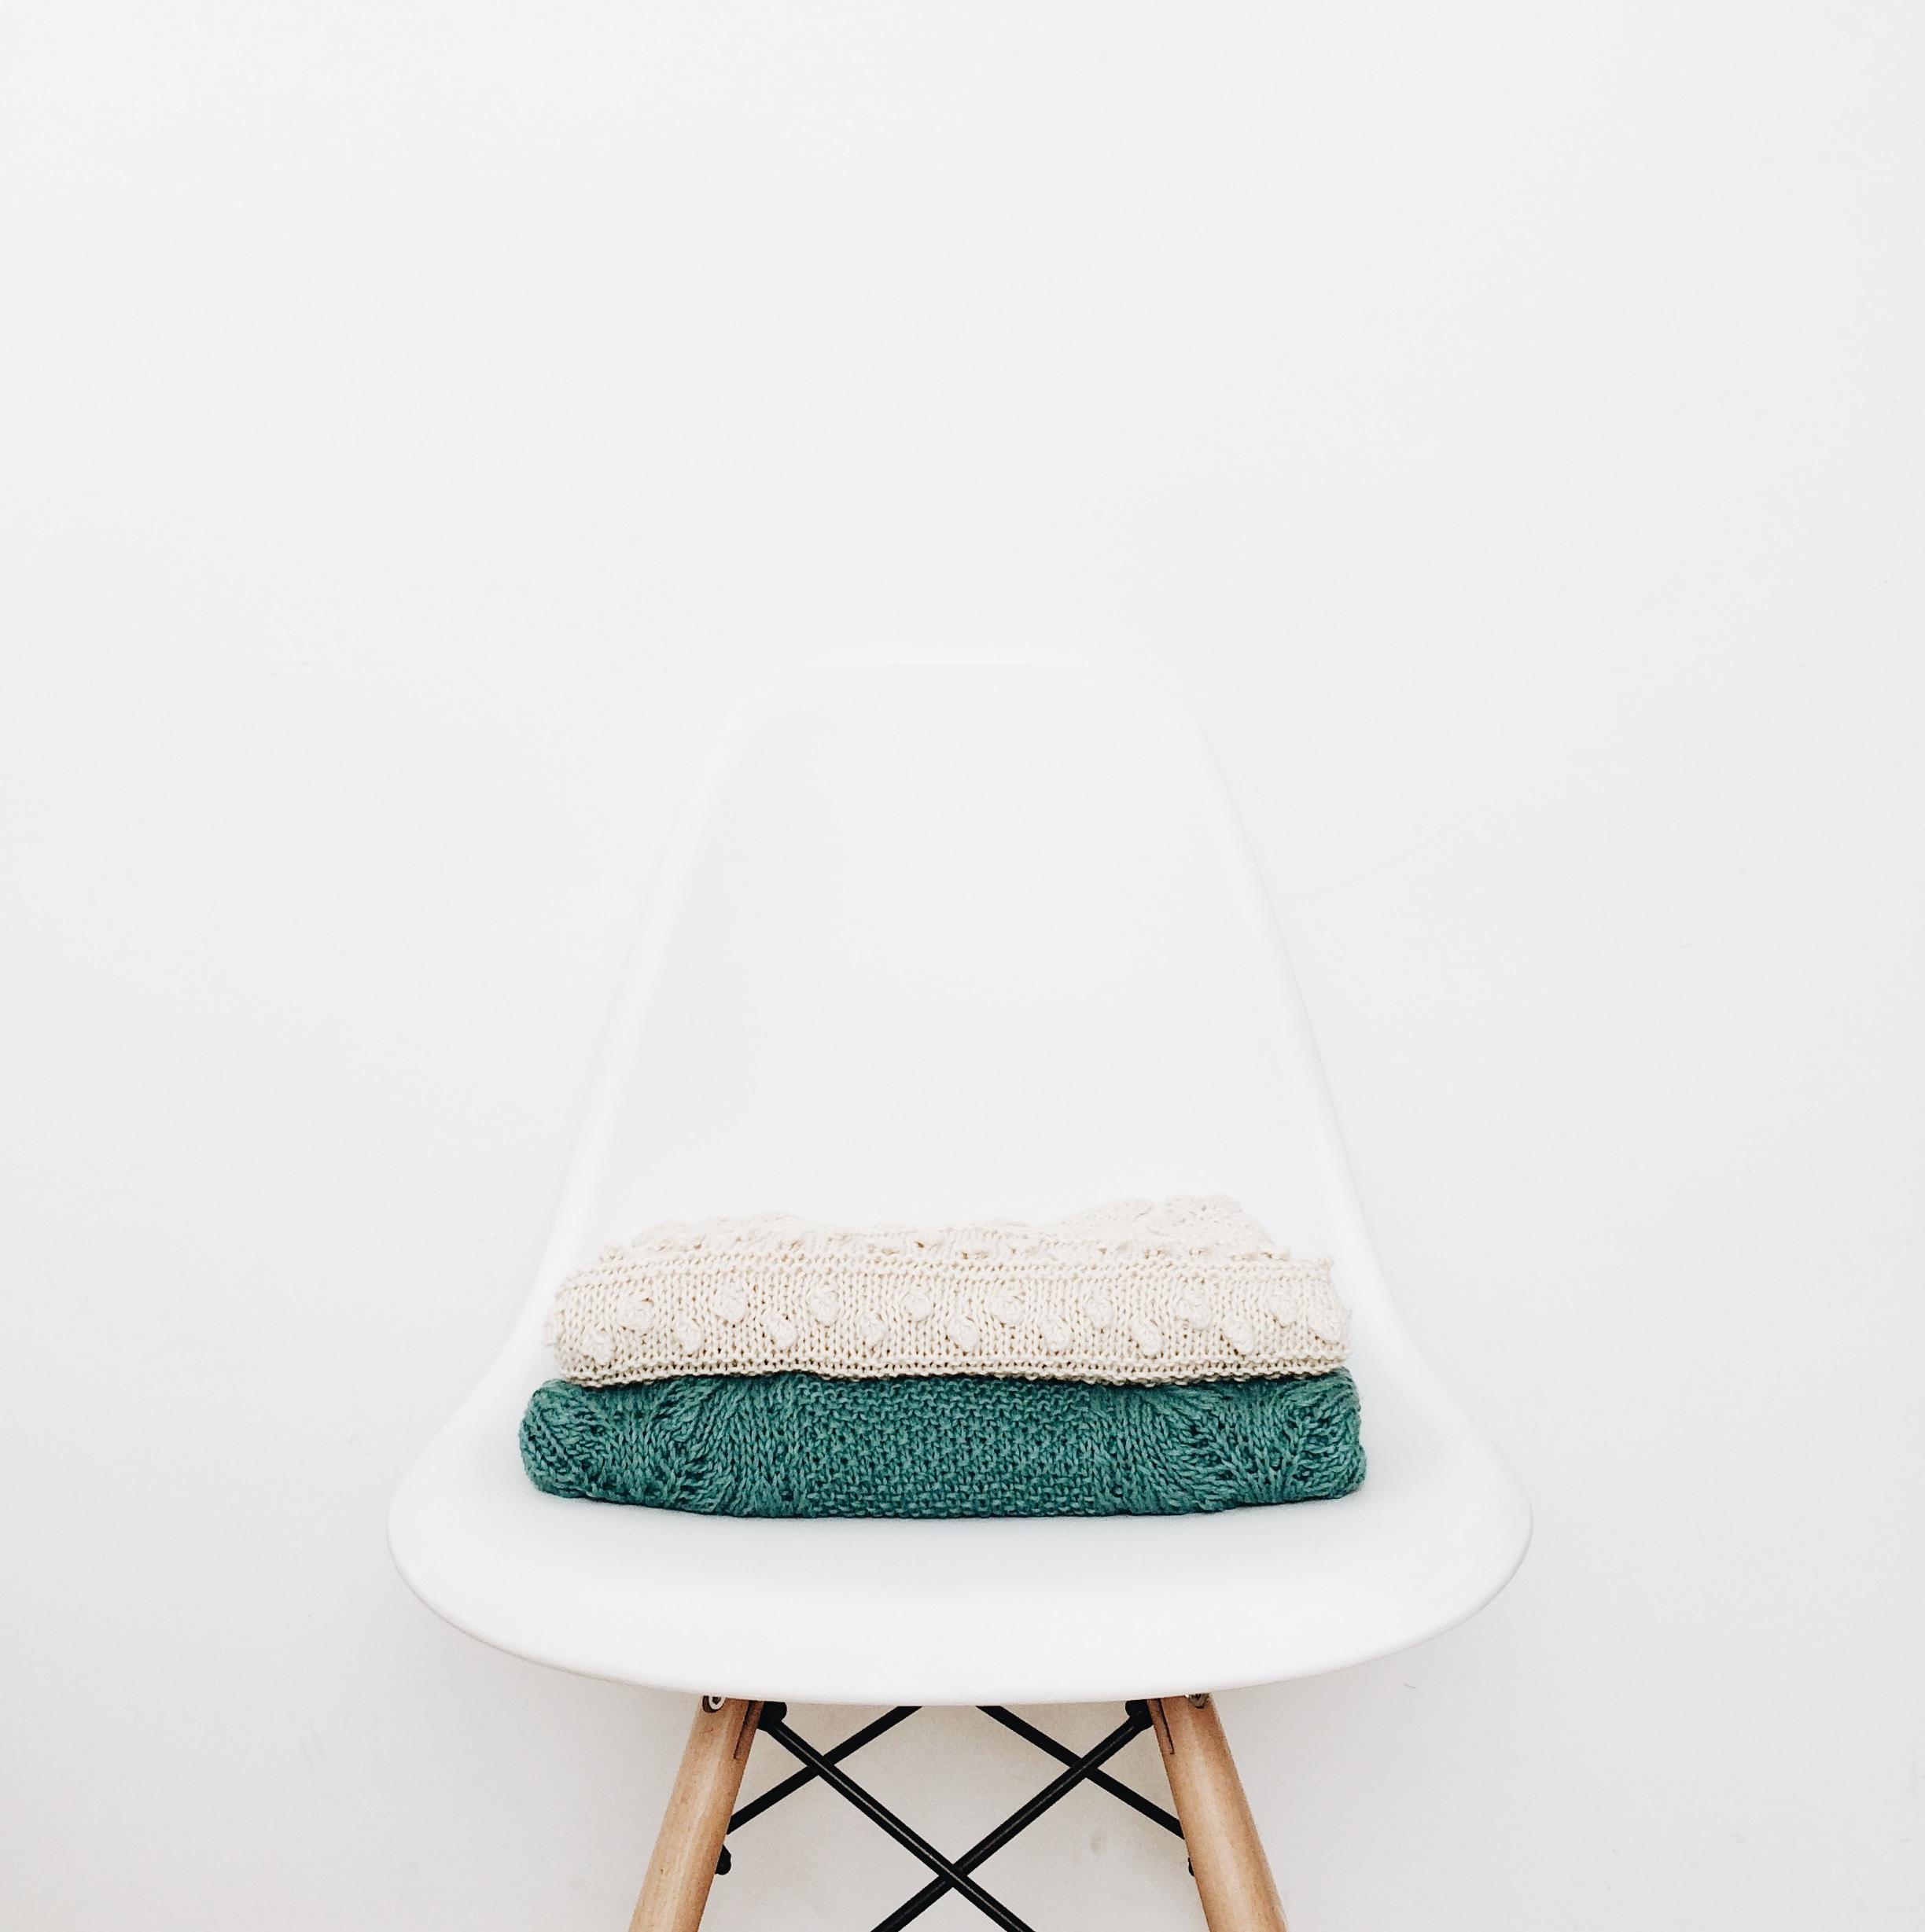 white and teal textile on white stool